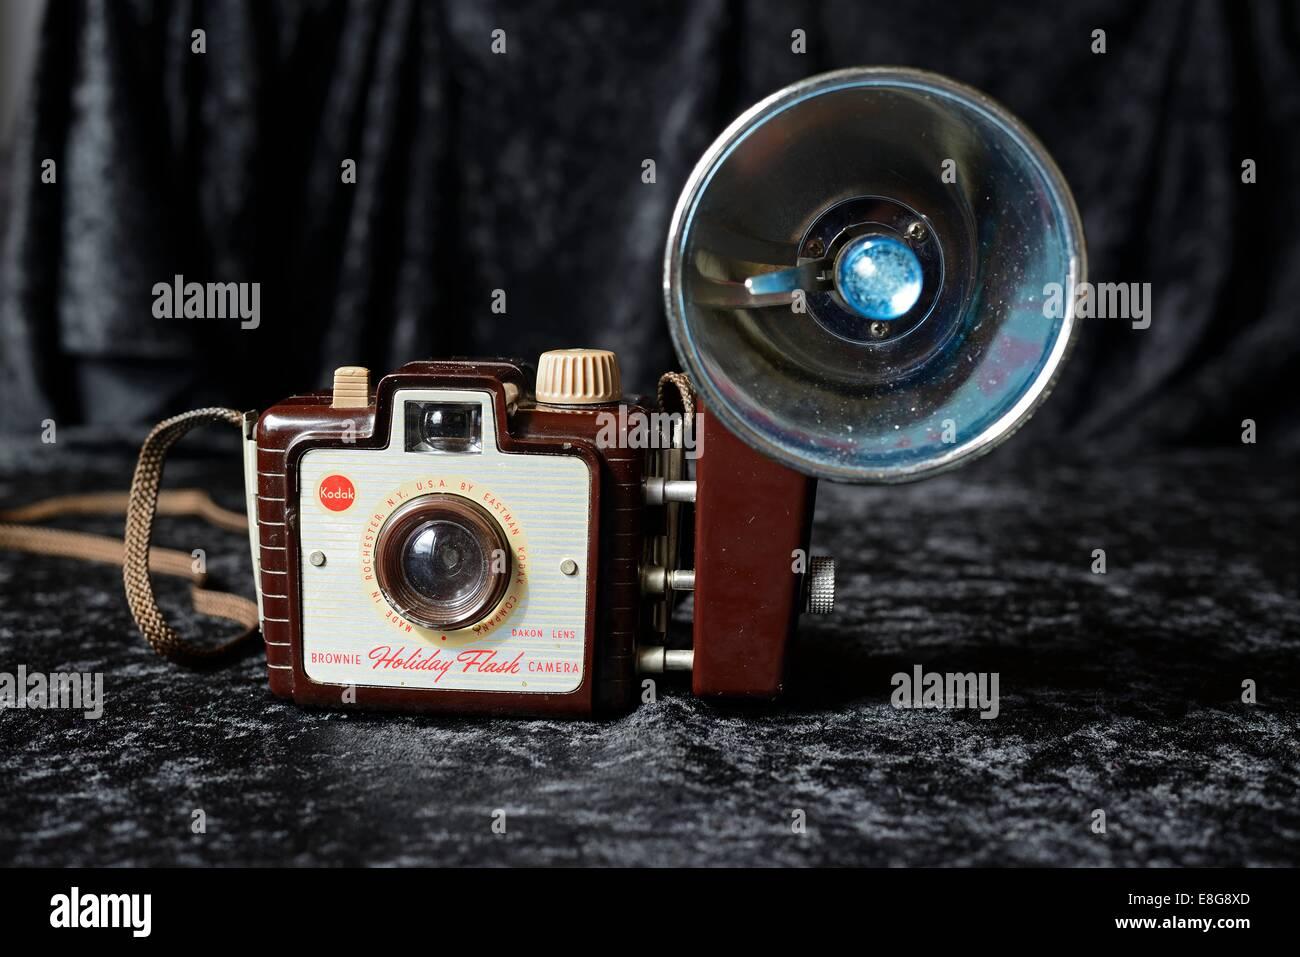 Kodak Brownie Holiday Flash camera - Stock Image